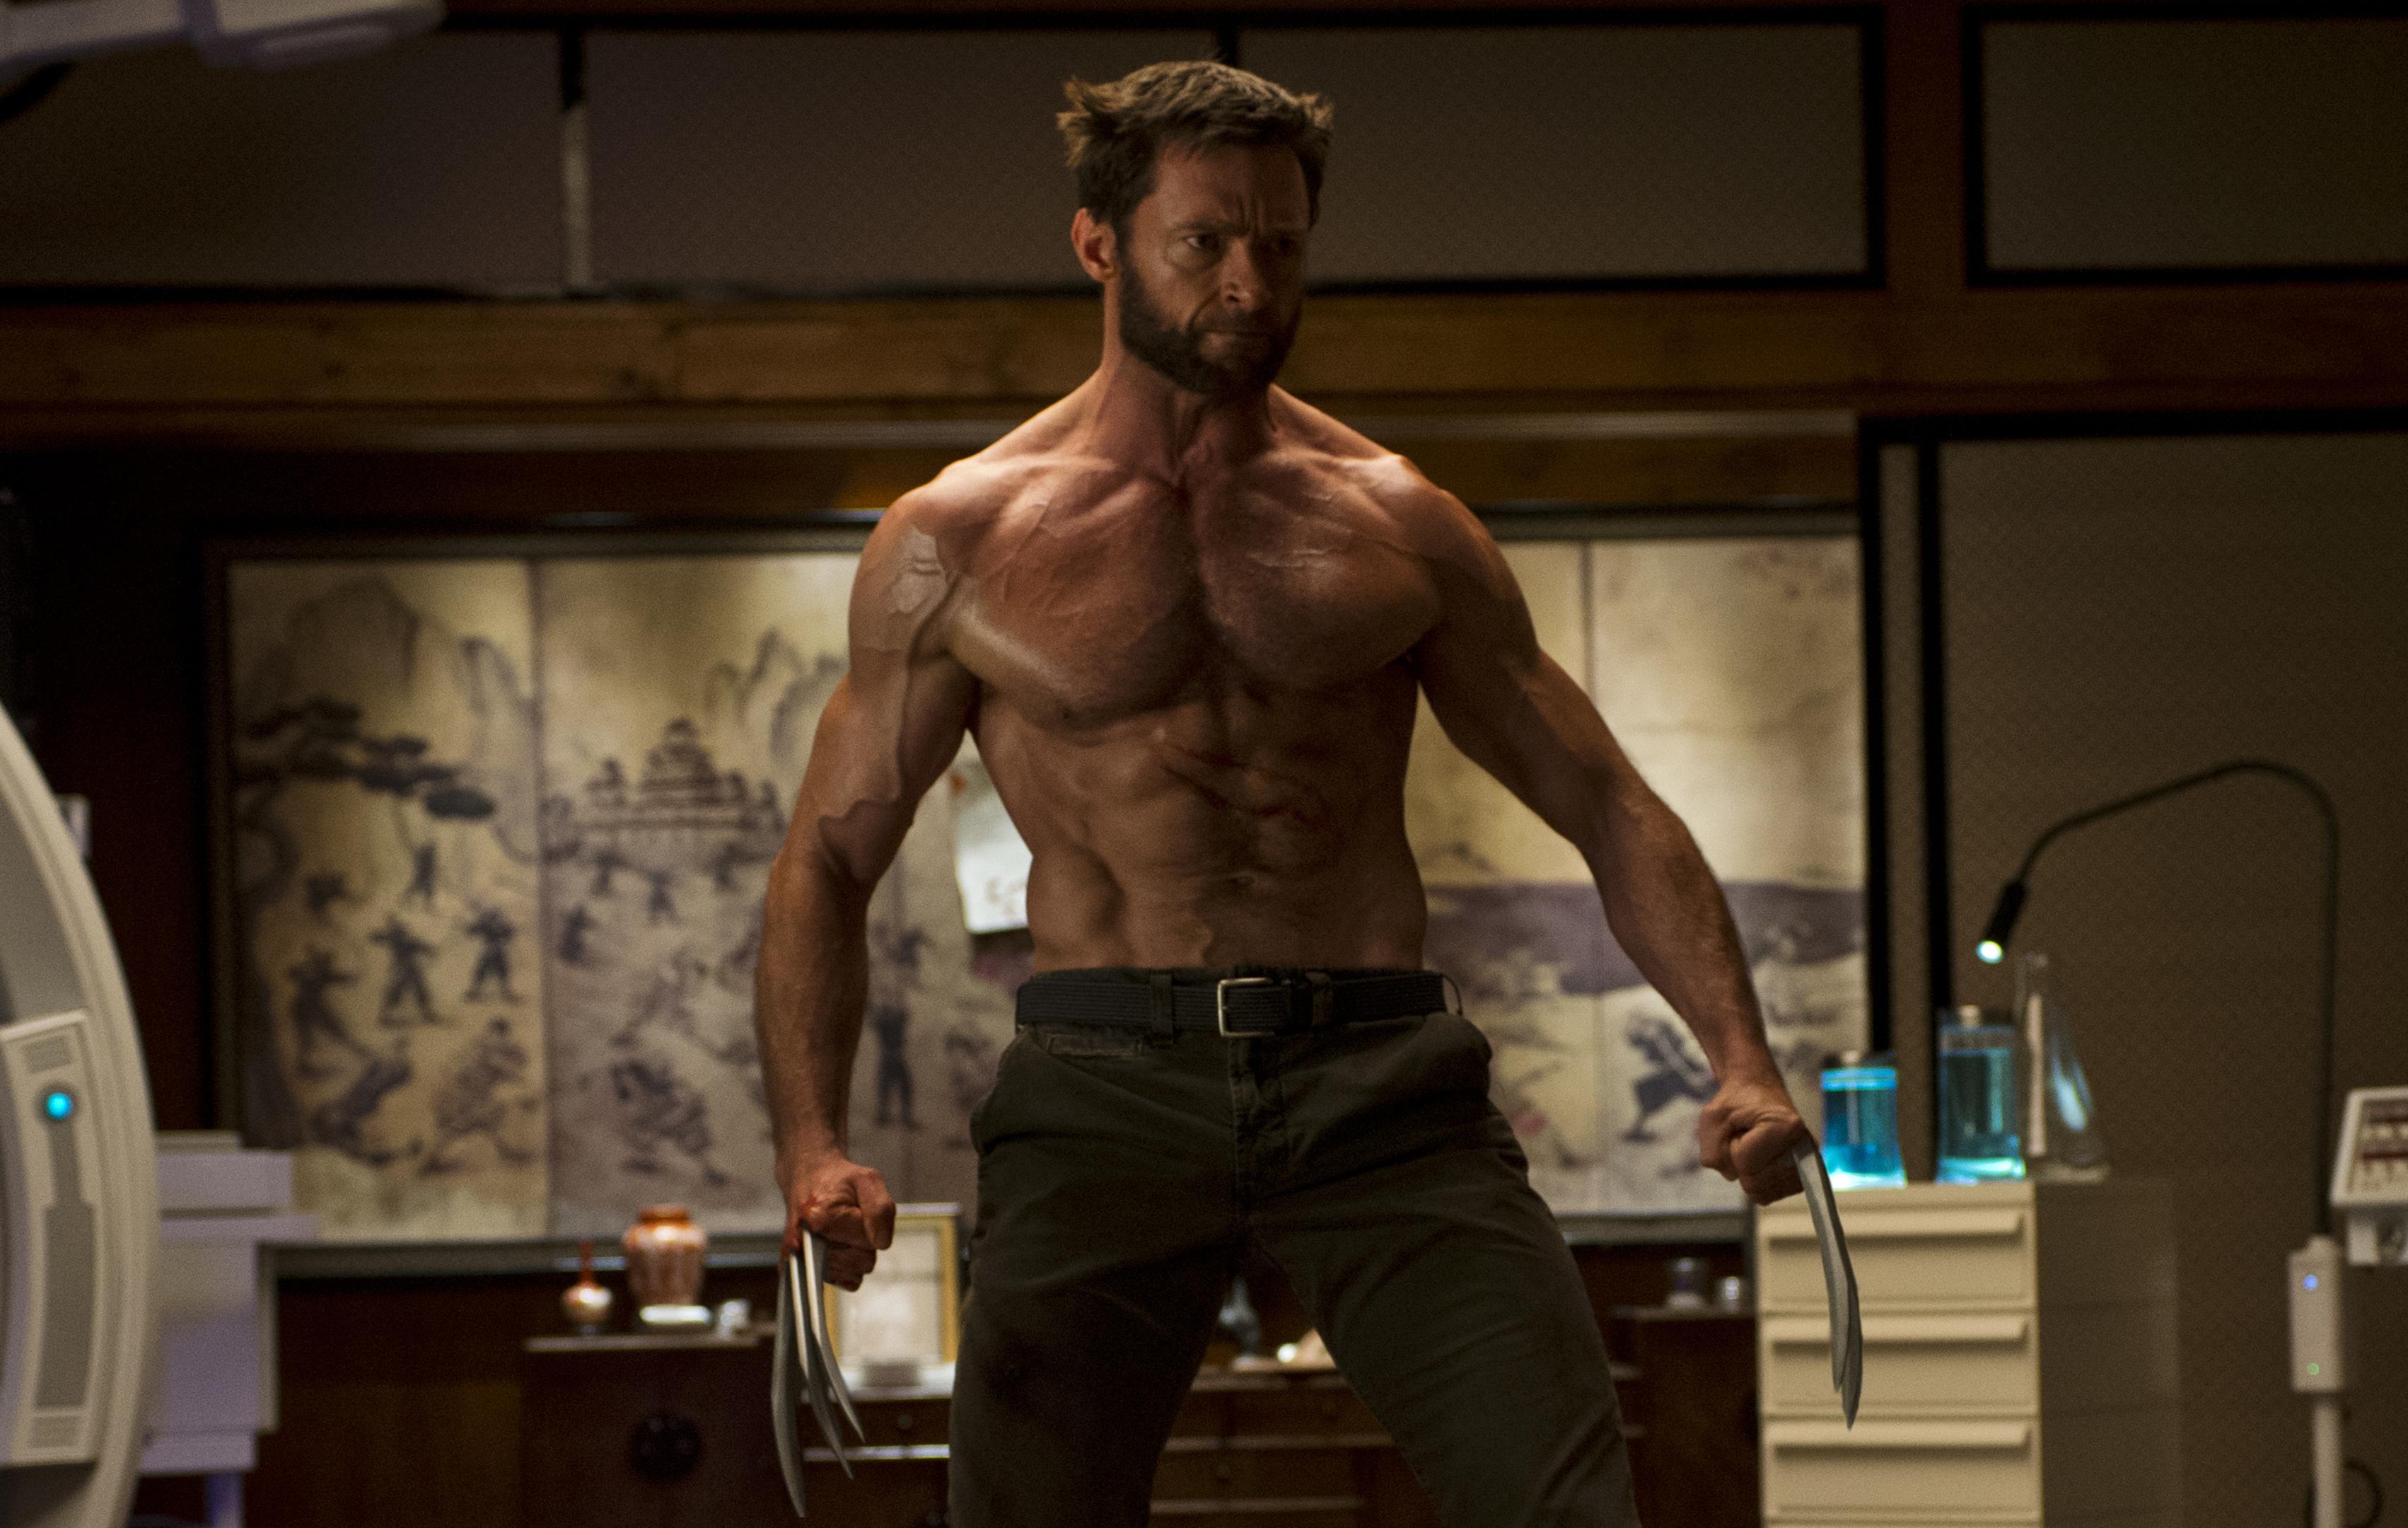 High Jackman as Wolverine.